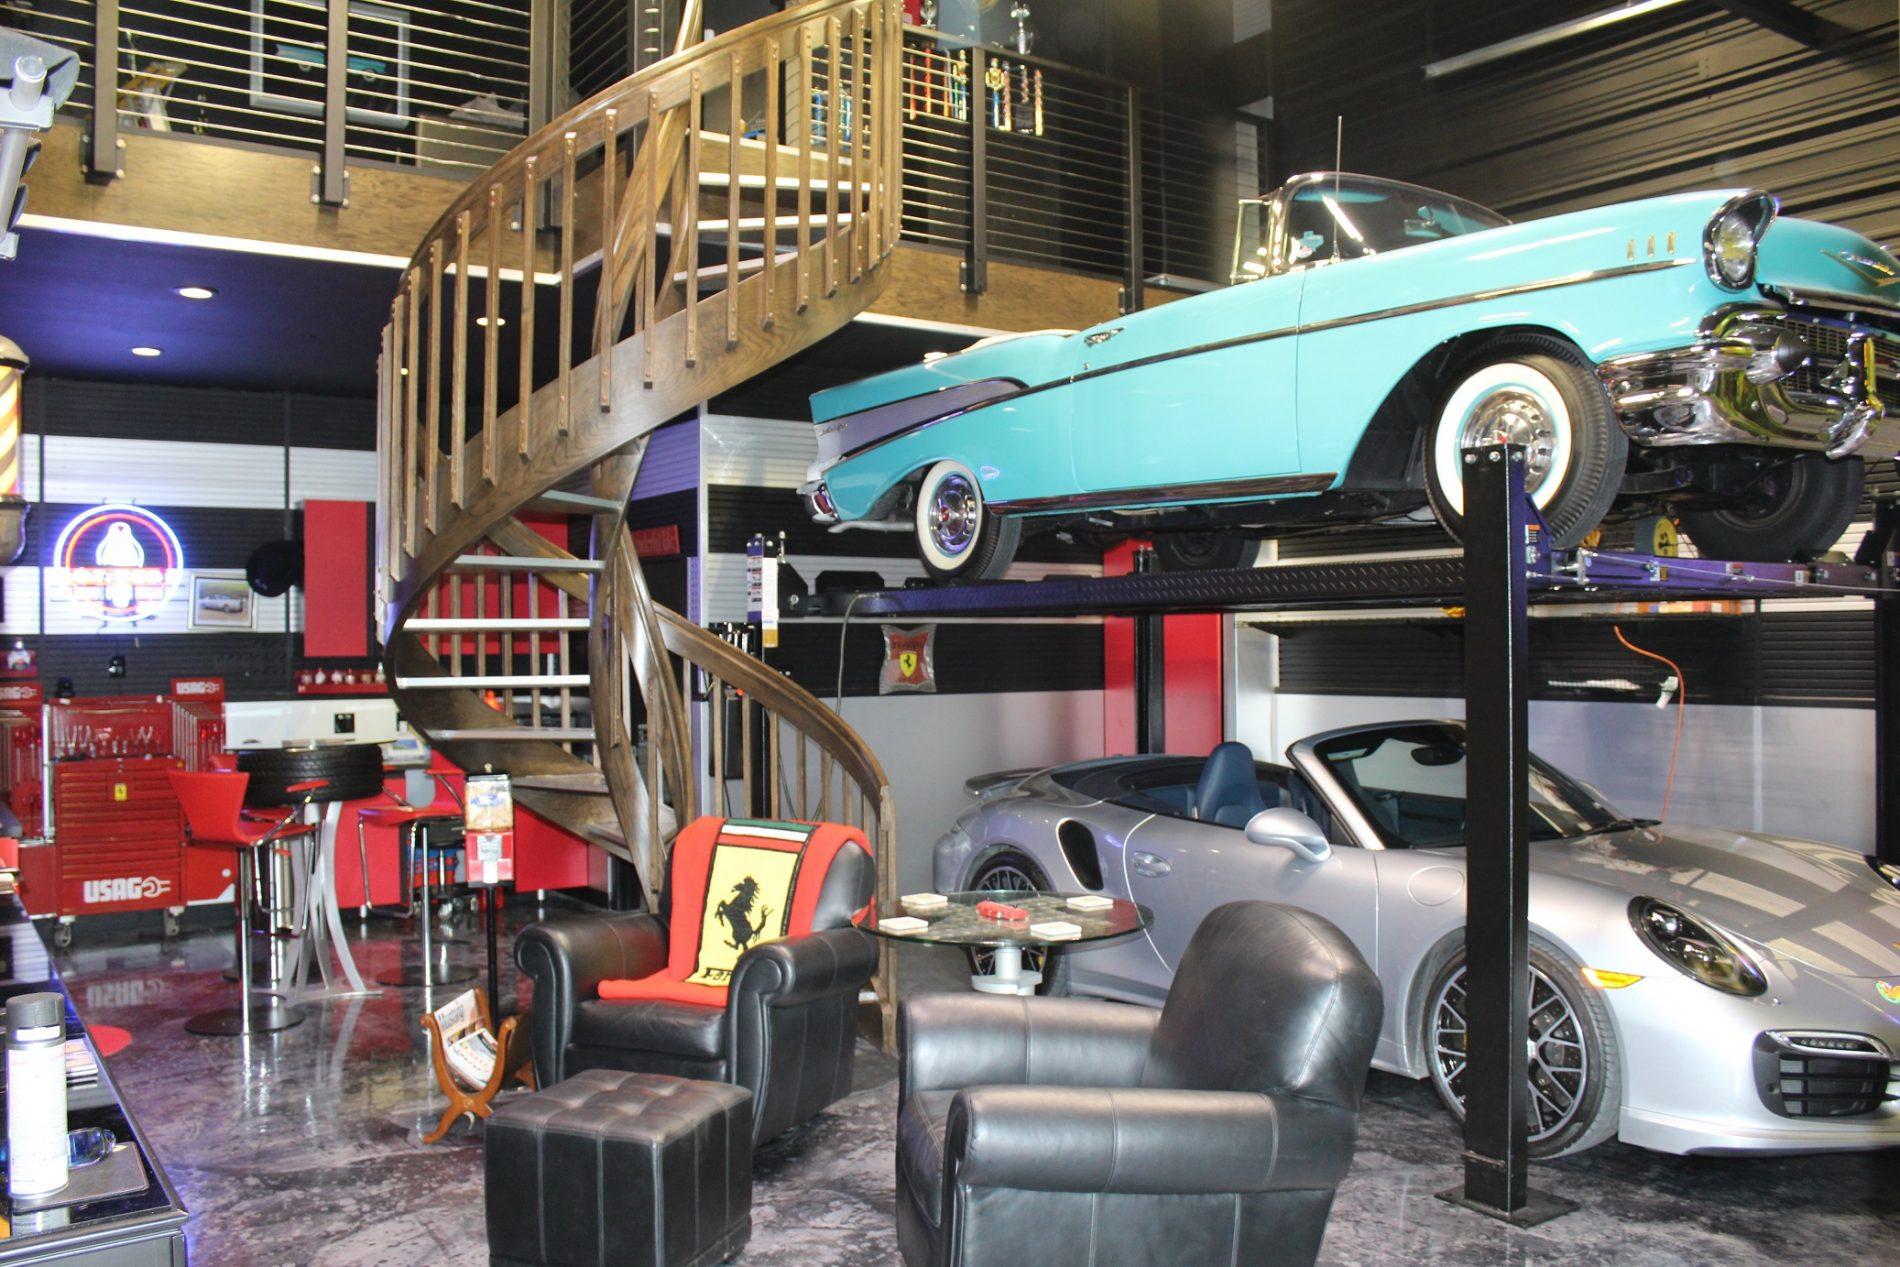 Garages of Texas